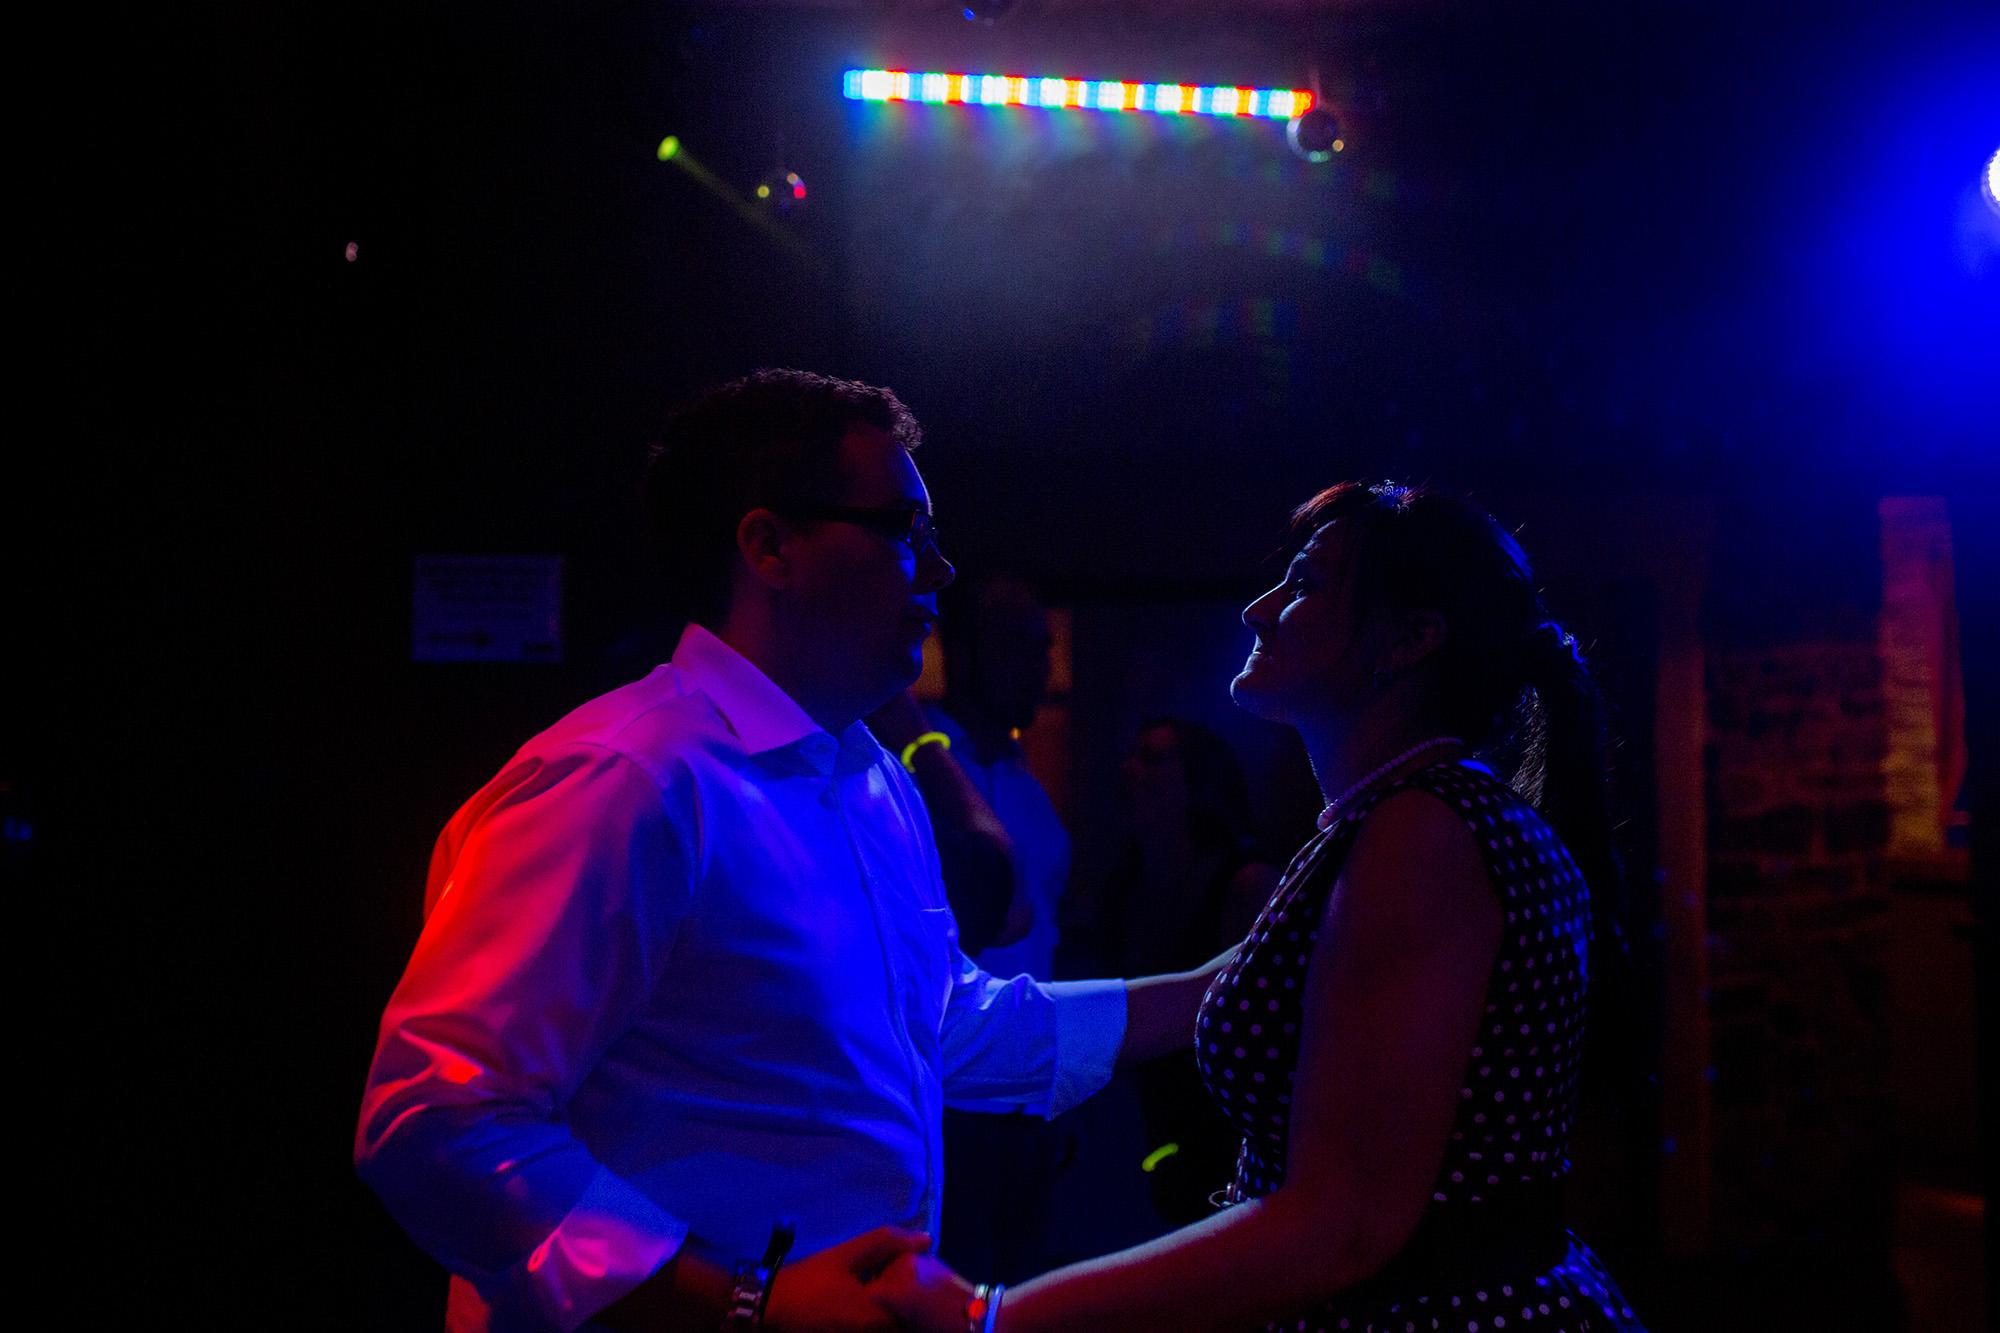 Seriously_Sabrina_Photography_Essen_Germany_RocknRoll_Hochzeit_Wedding_PatrickJenny167.jpg